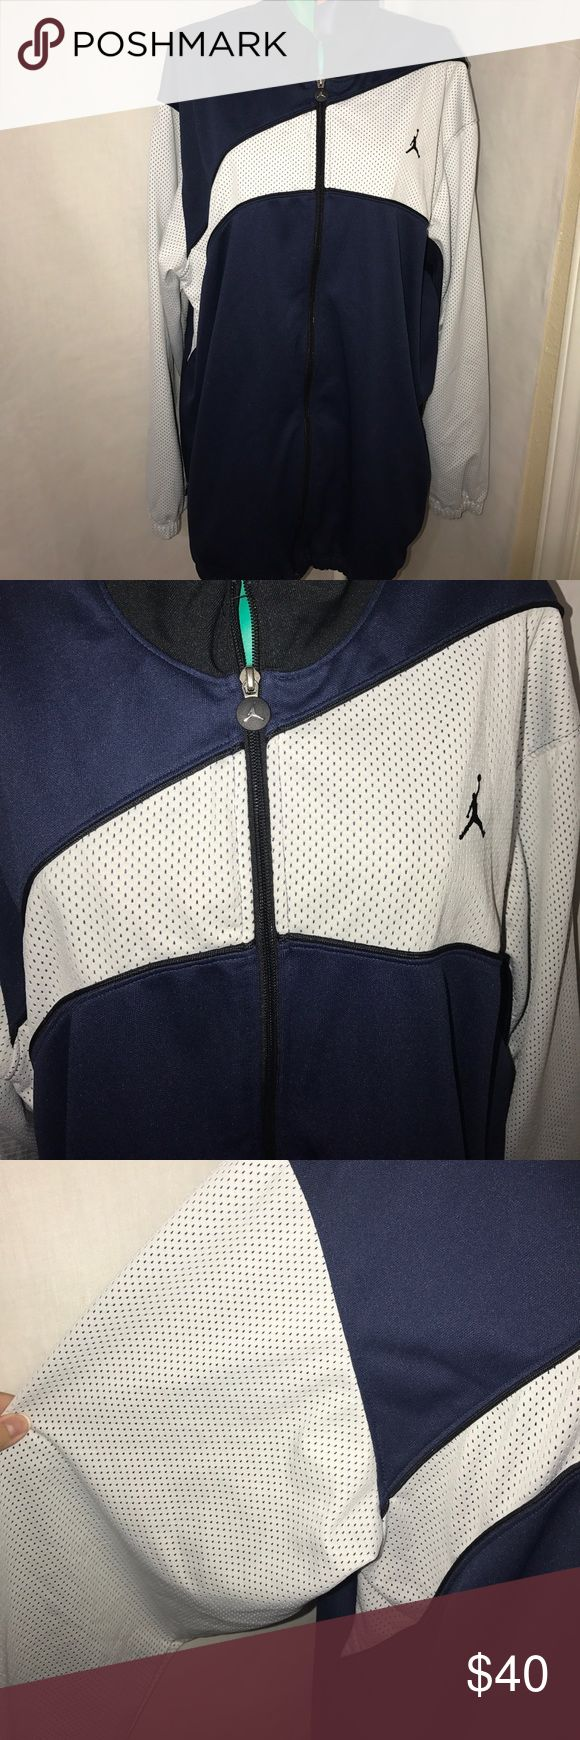 Men's air Jordan jacket XL Navy blue, white, and black Air Jordan jacket size XL. This jacket is in perfect conditions. Air Jordan Jackets & Coats Performance Jackets